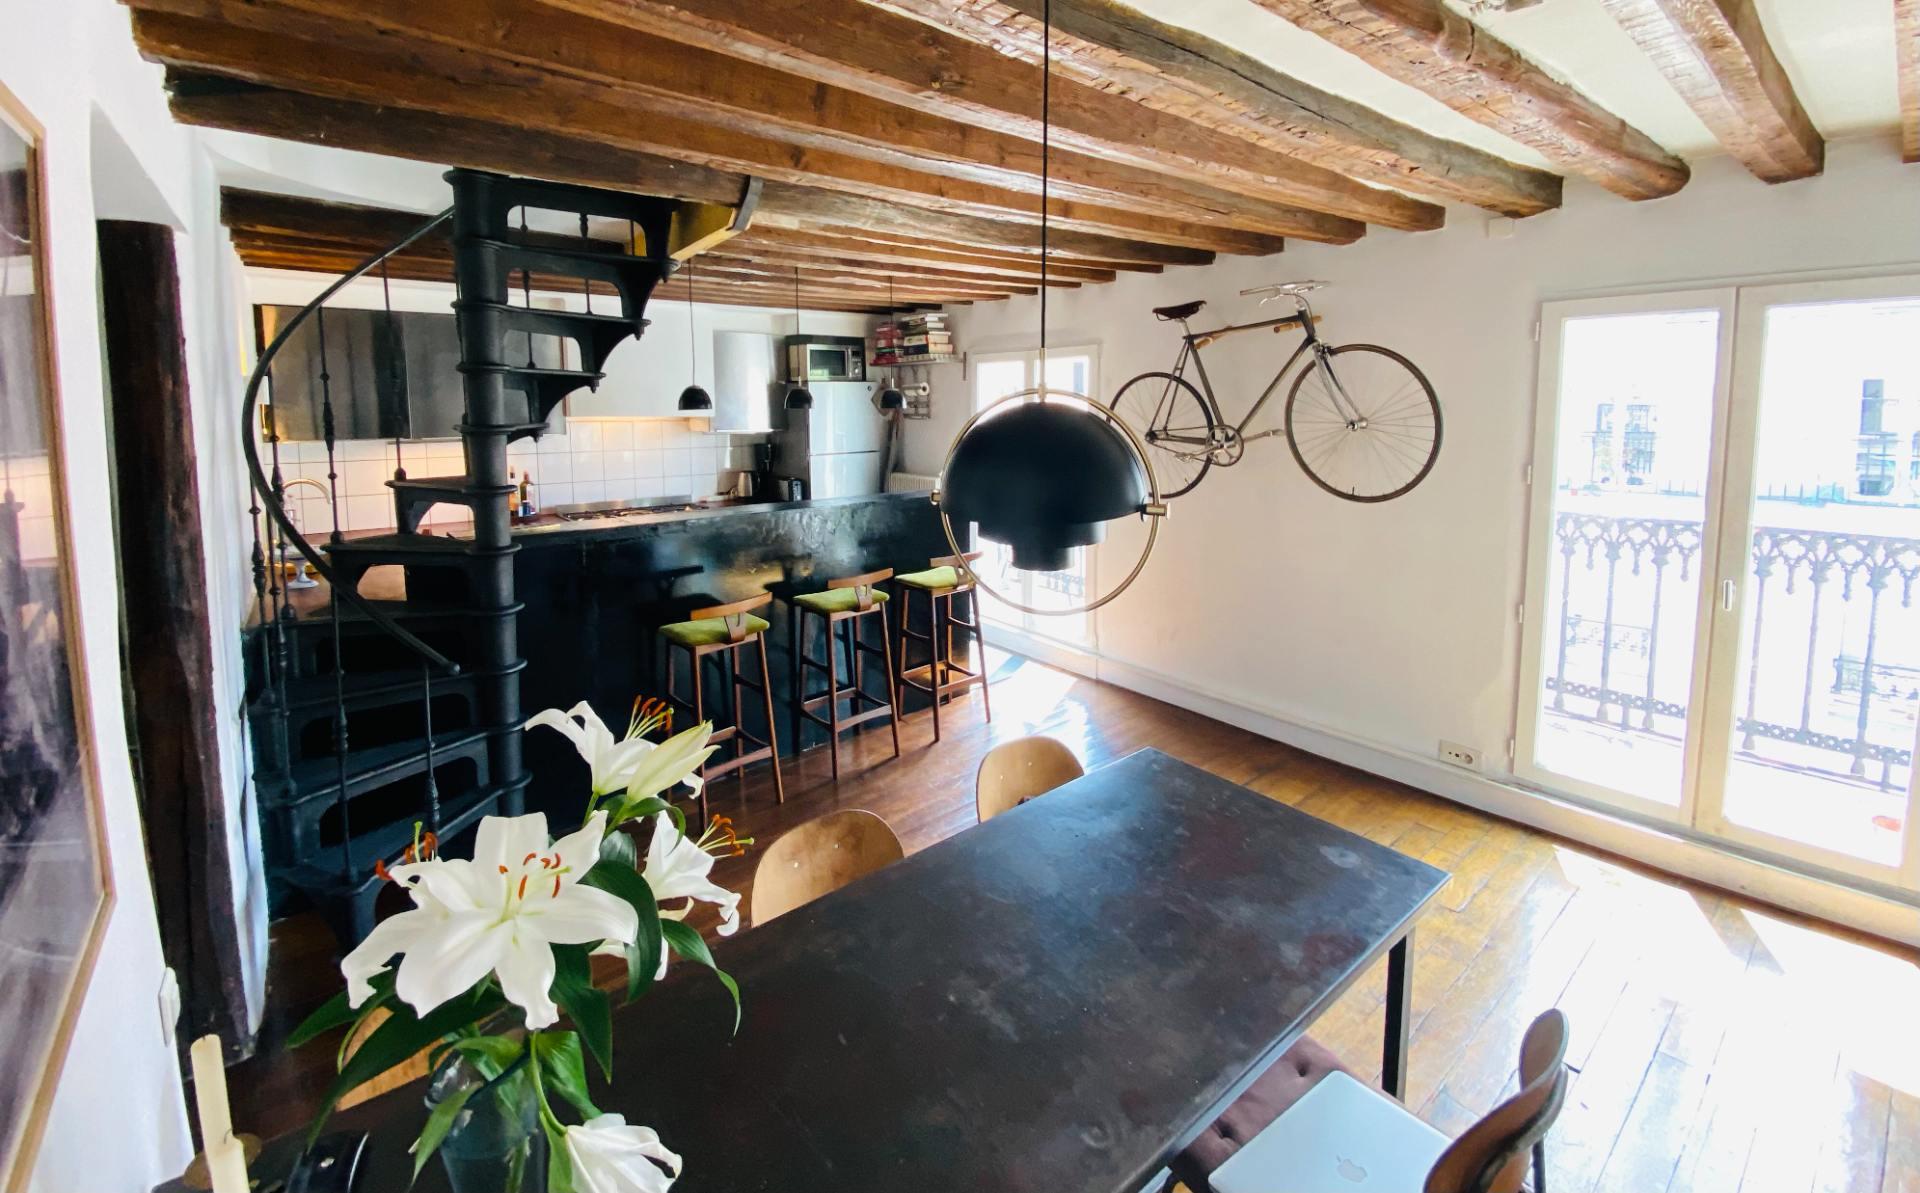 Duplex on the last floor 81.43m² (62.41m² Law Carrez) – Balcony of 11.5m² 3